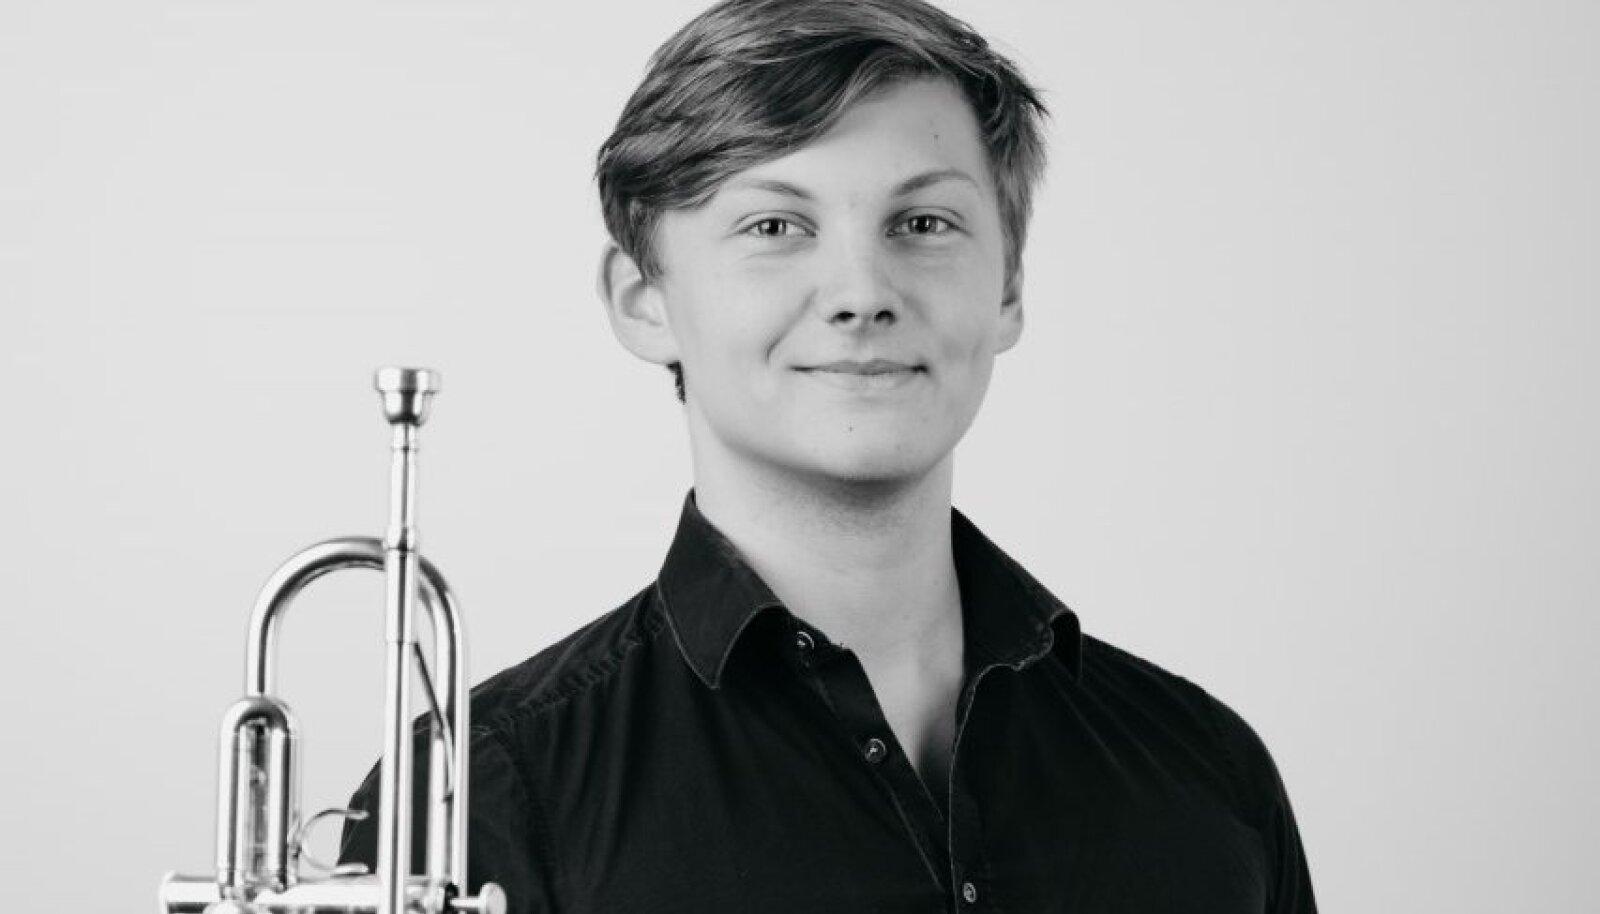 Sander Teras